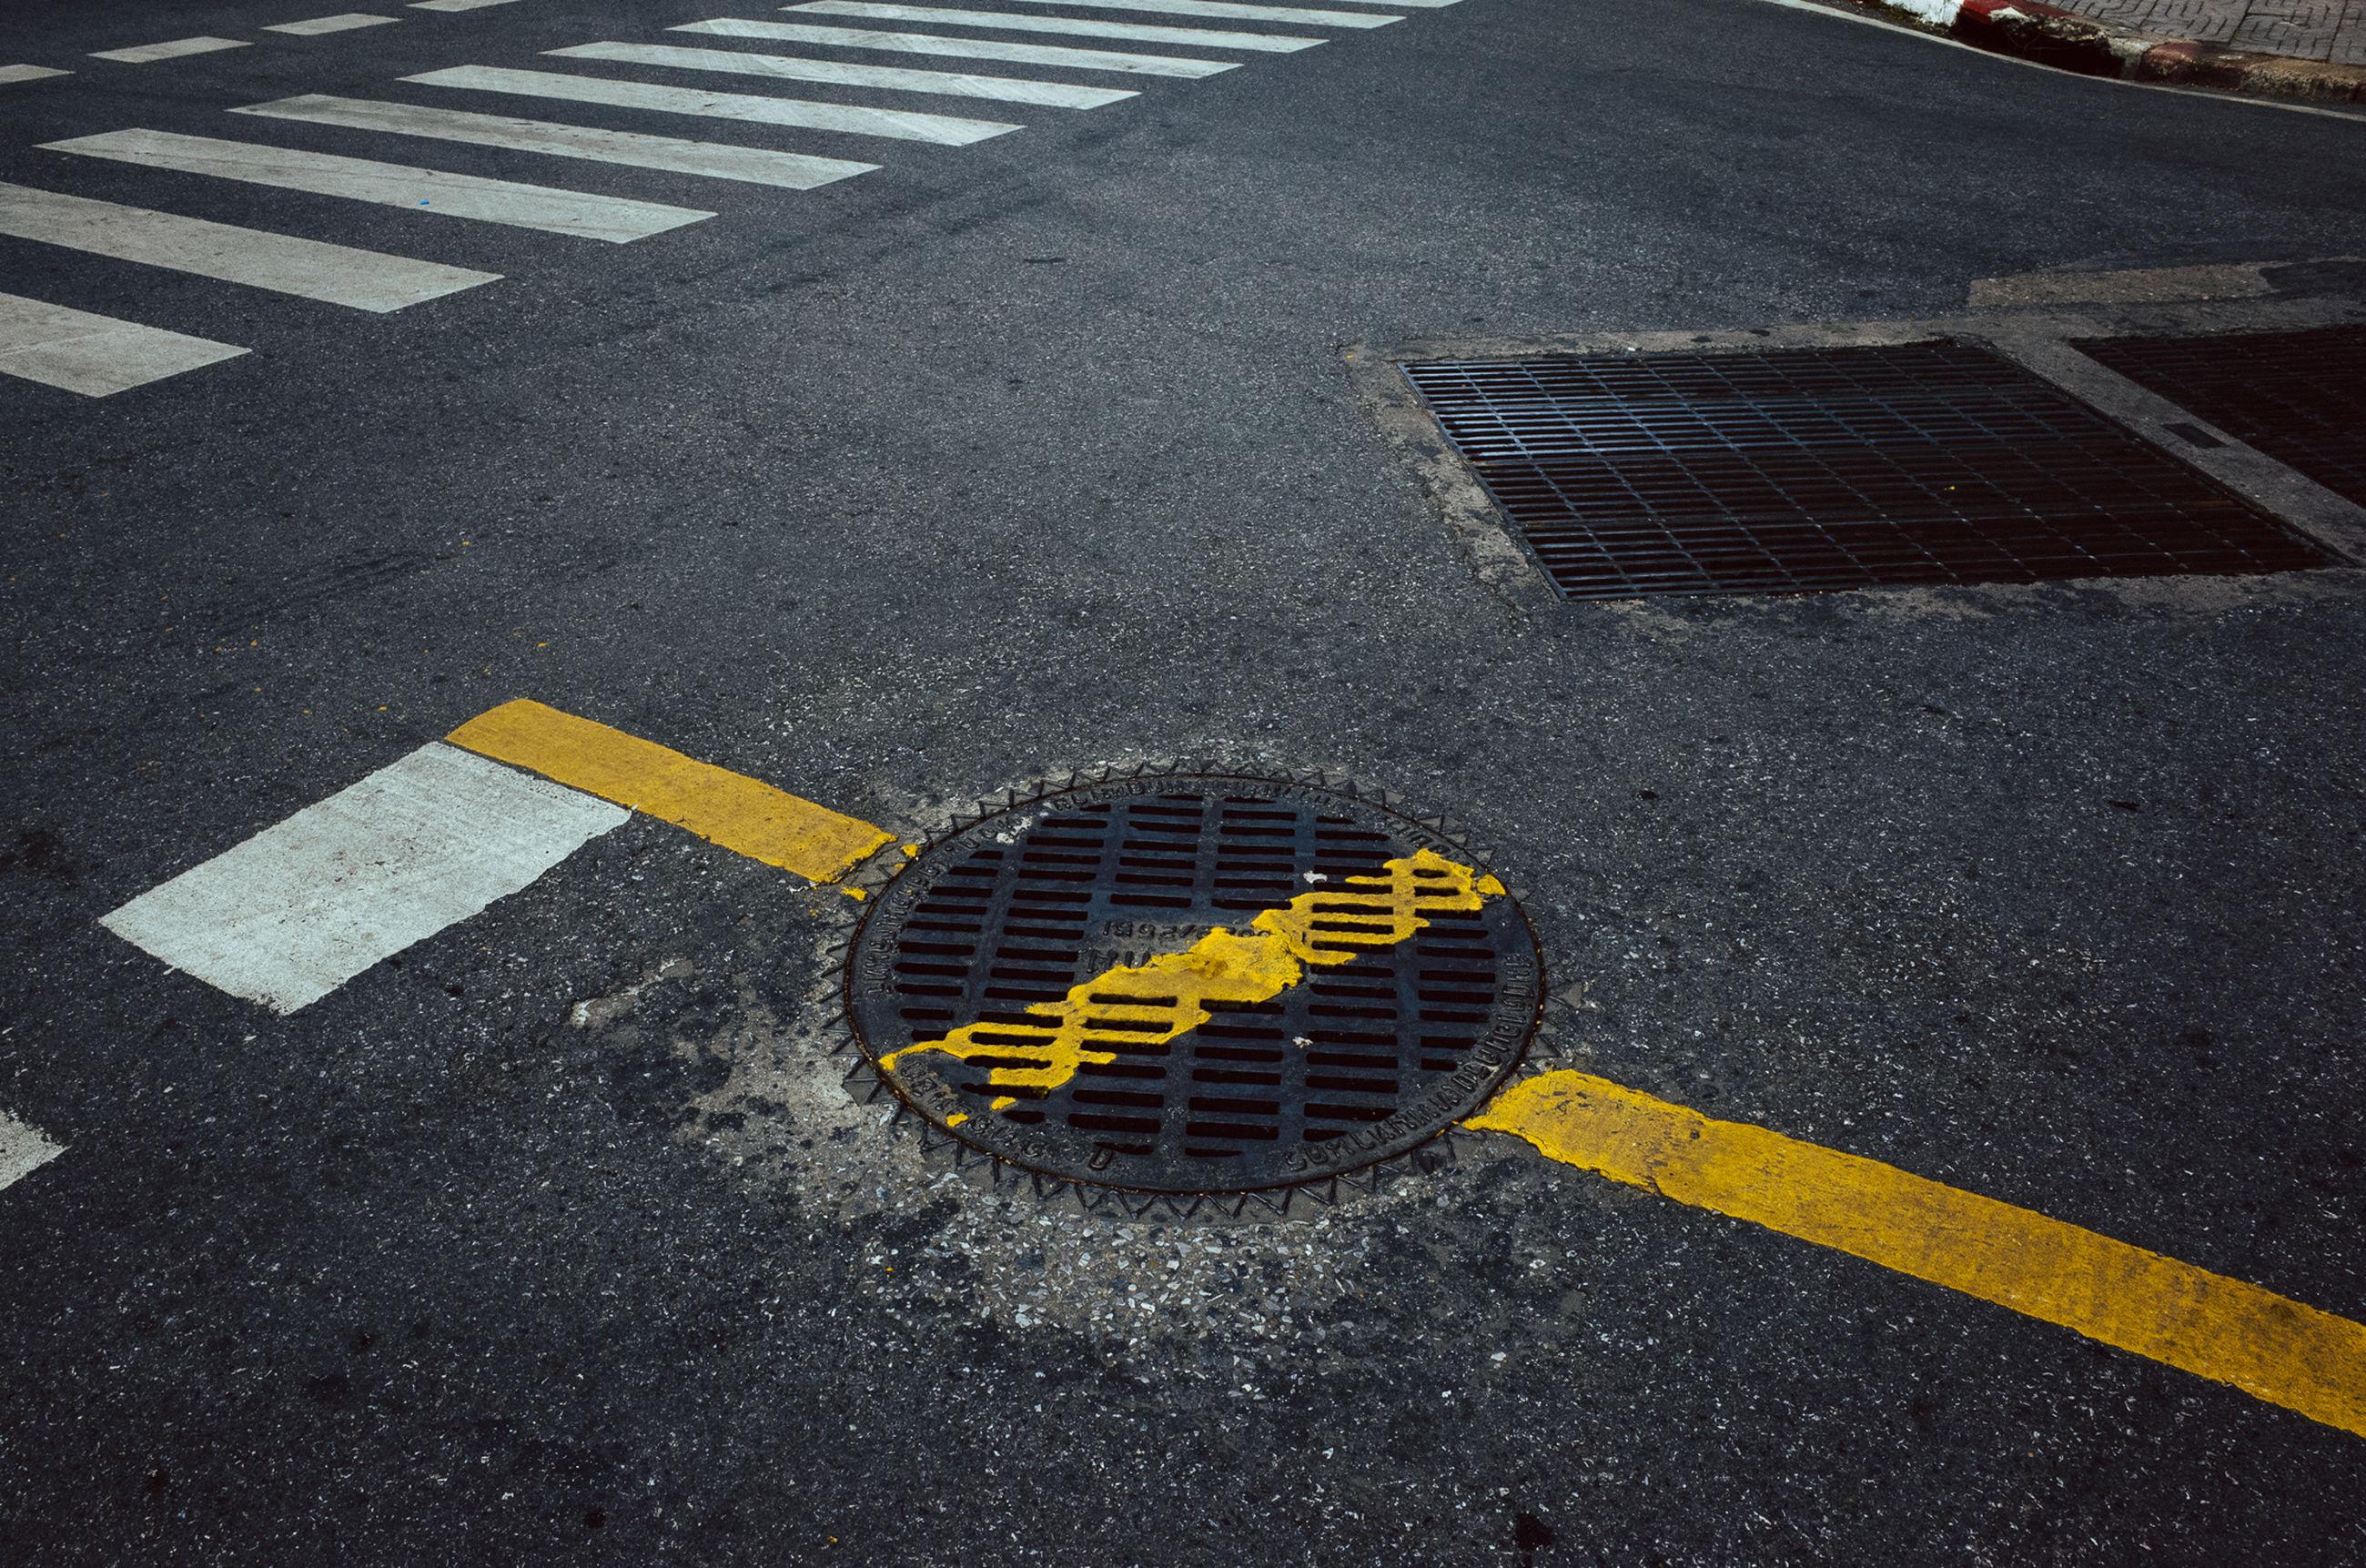 asphalt, transportation, road, metal grate, outdoors, day, no people